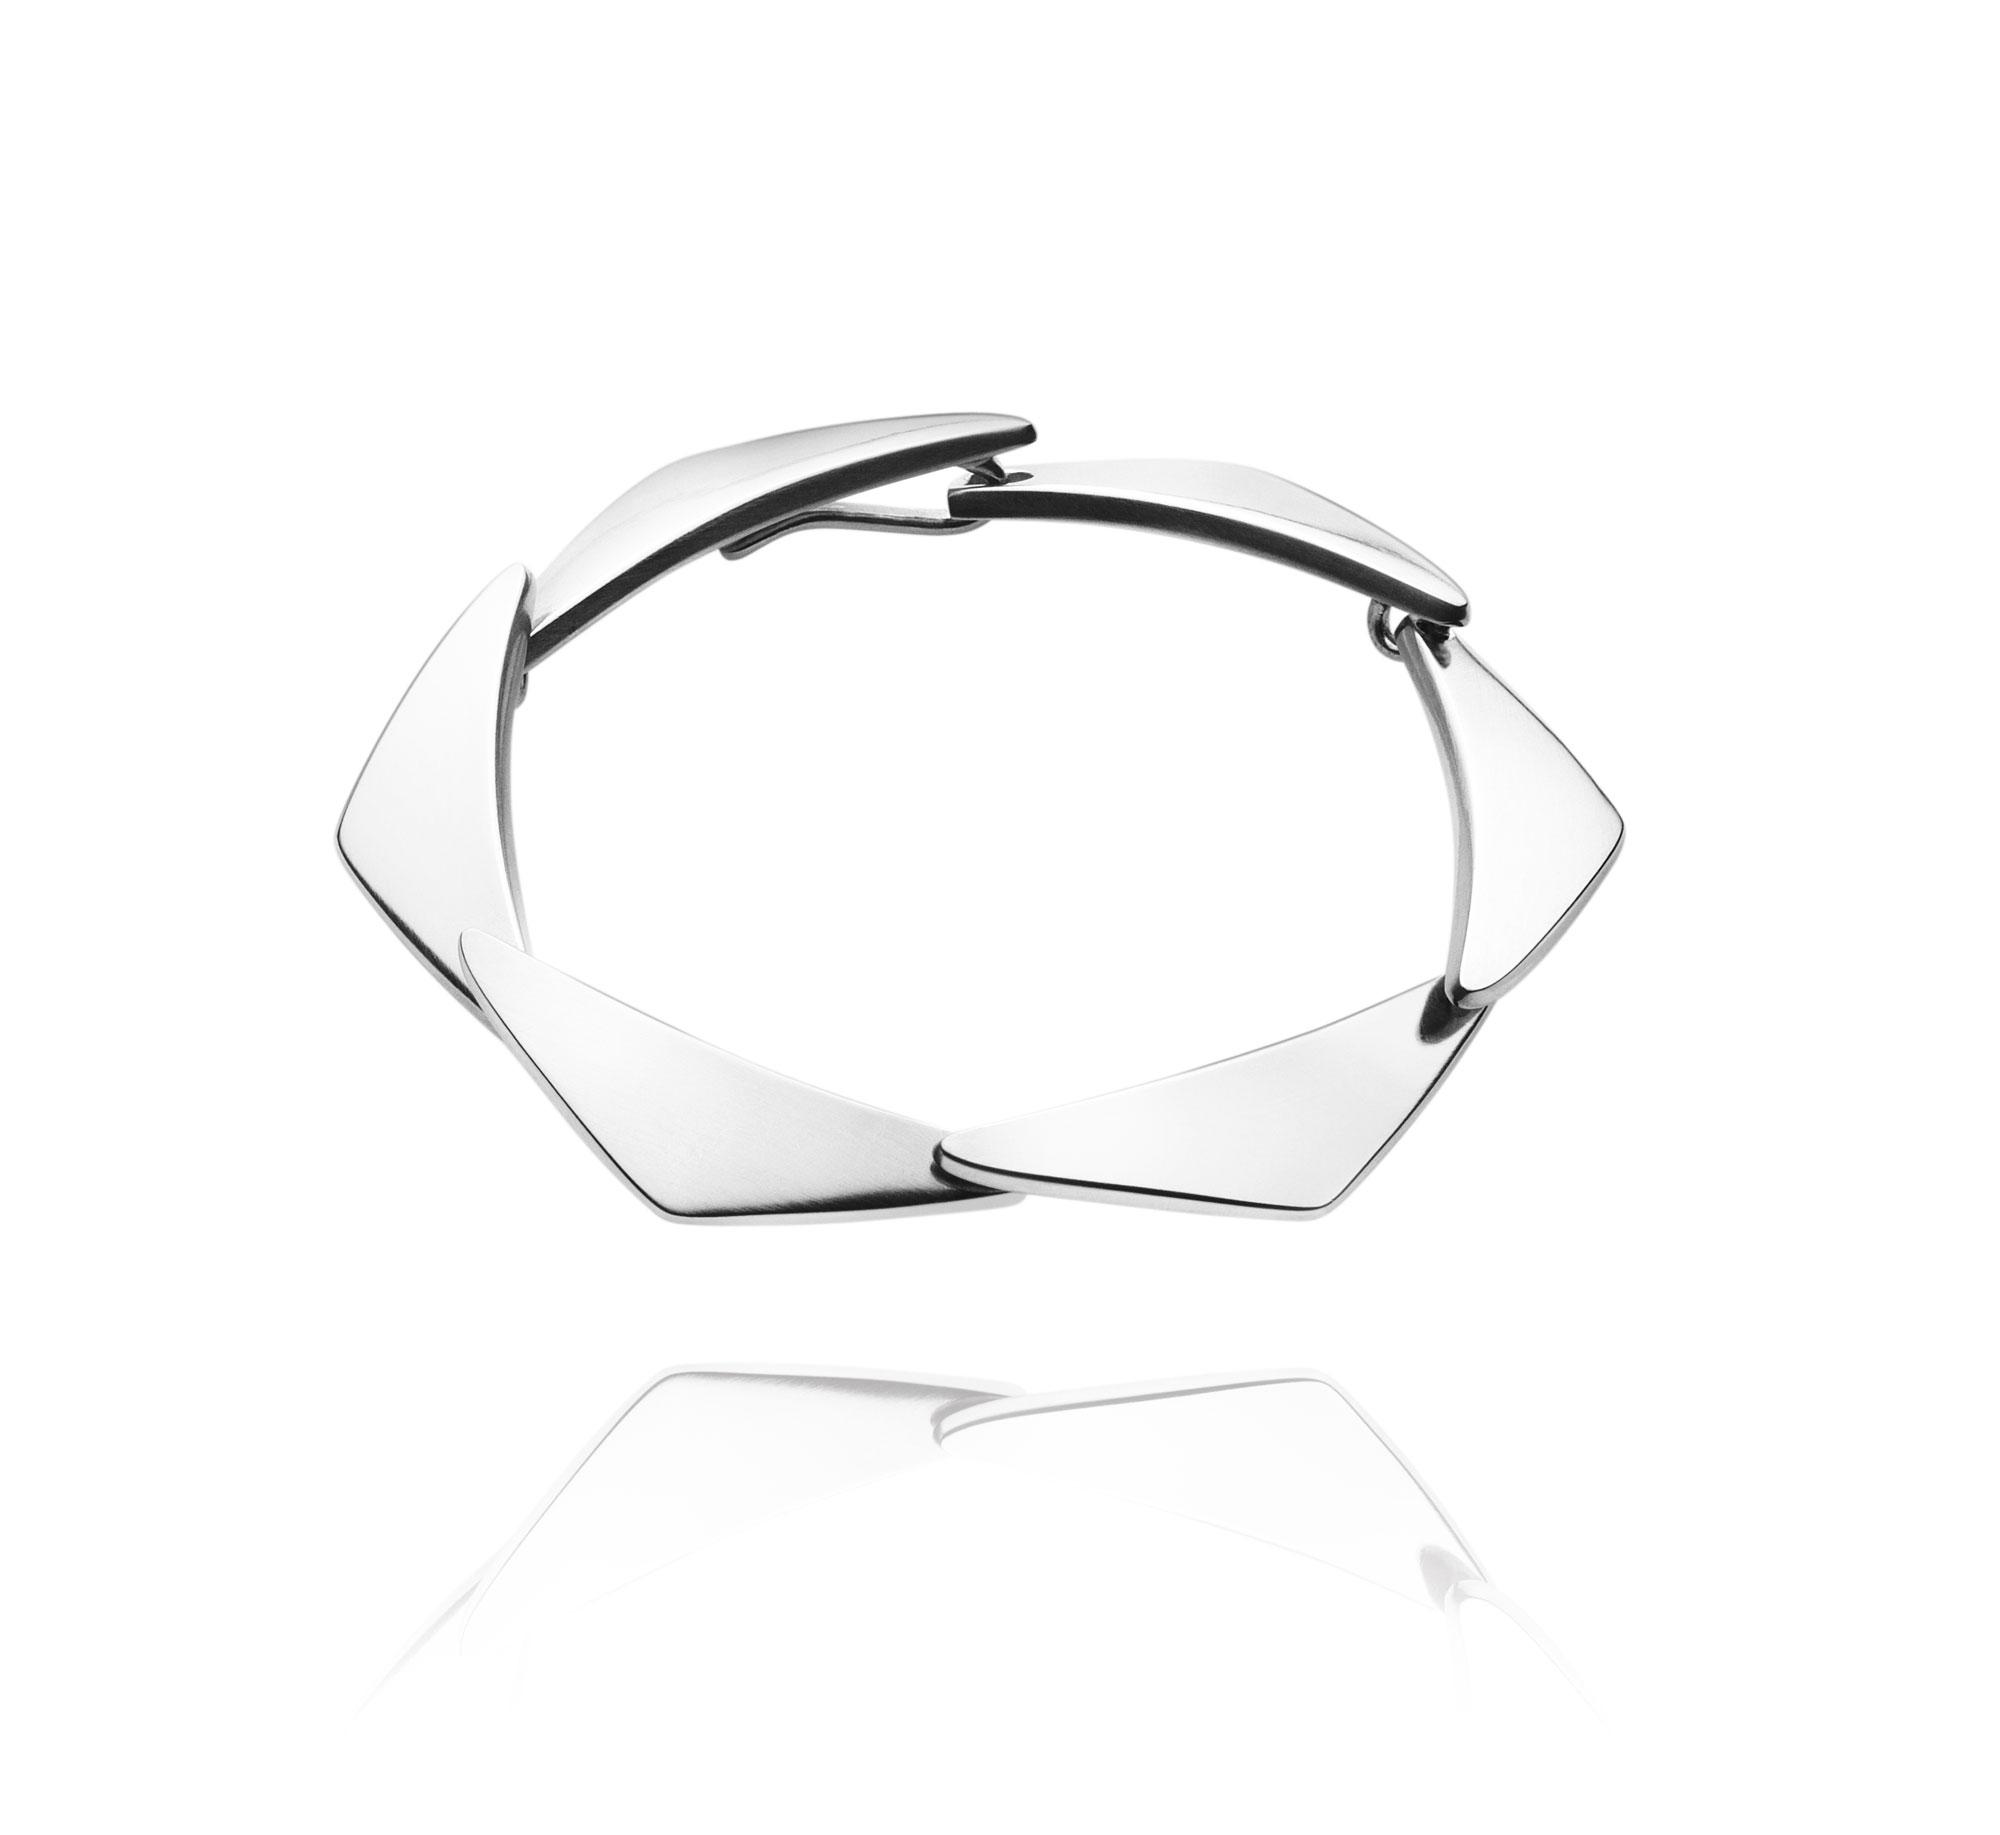 Georg Jensen PEAK armbånd 7 led - 3531257 2000052600SM Sølv SM